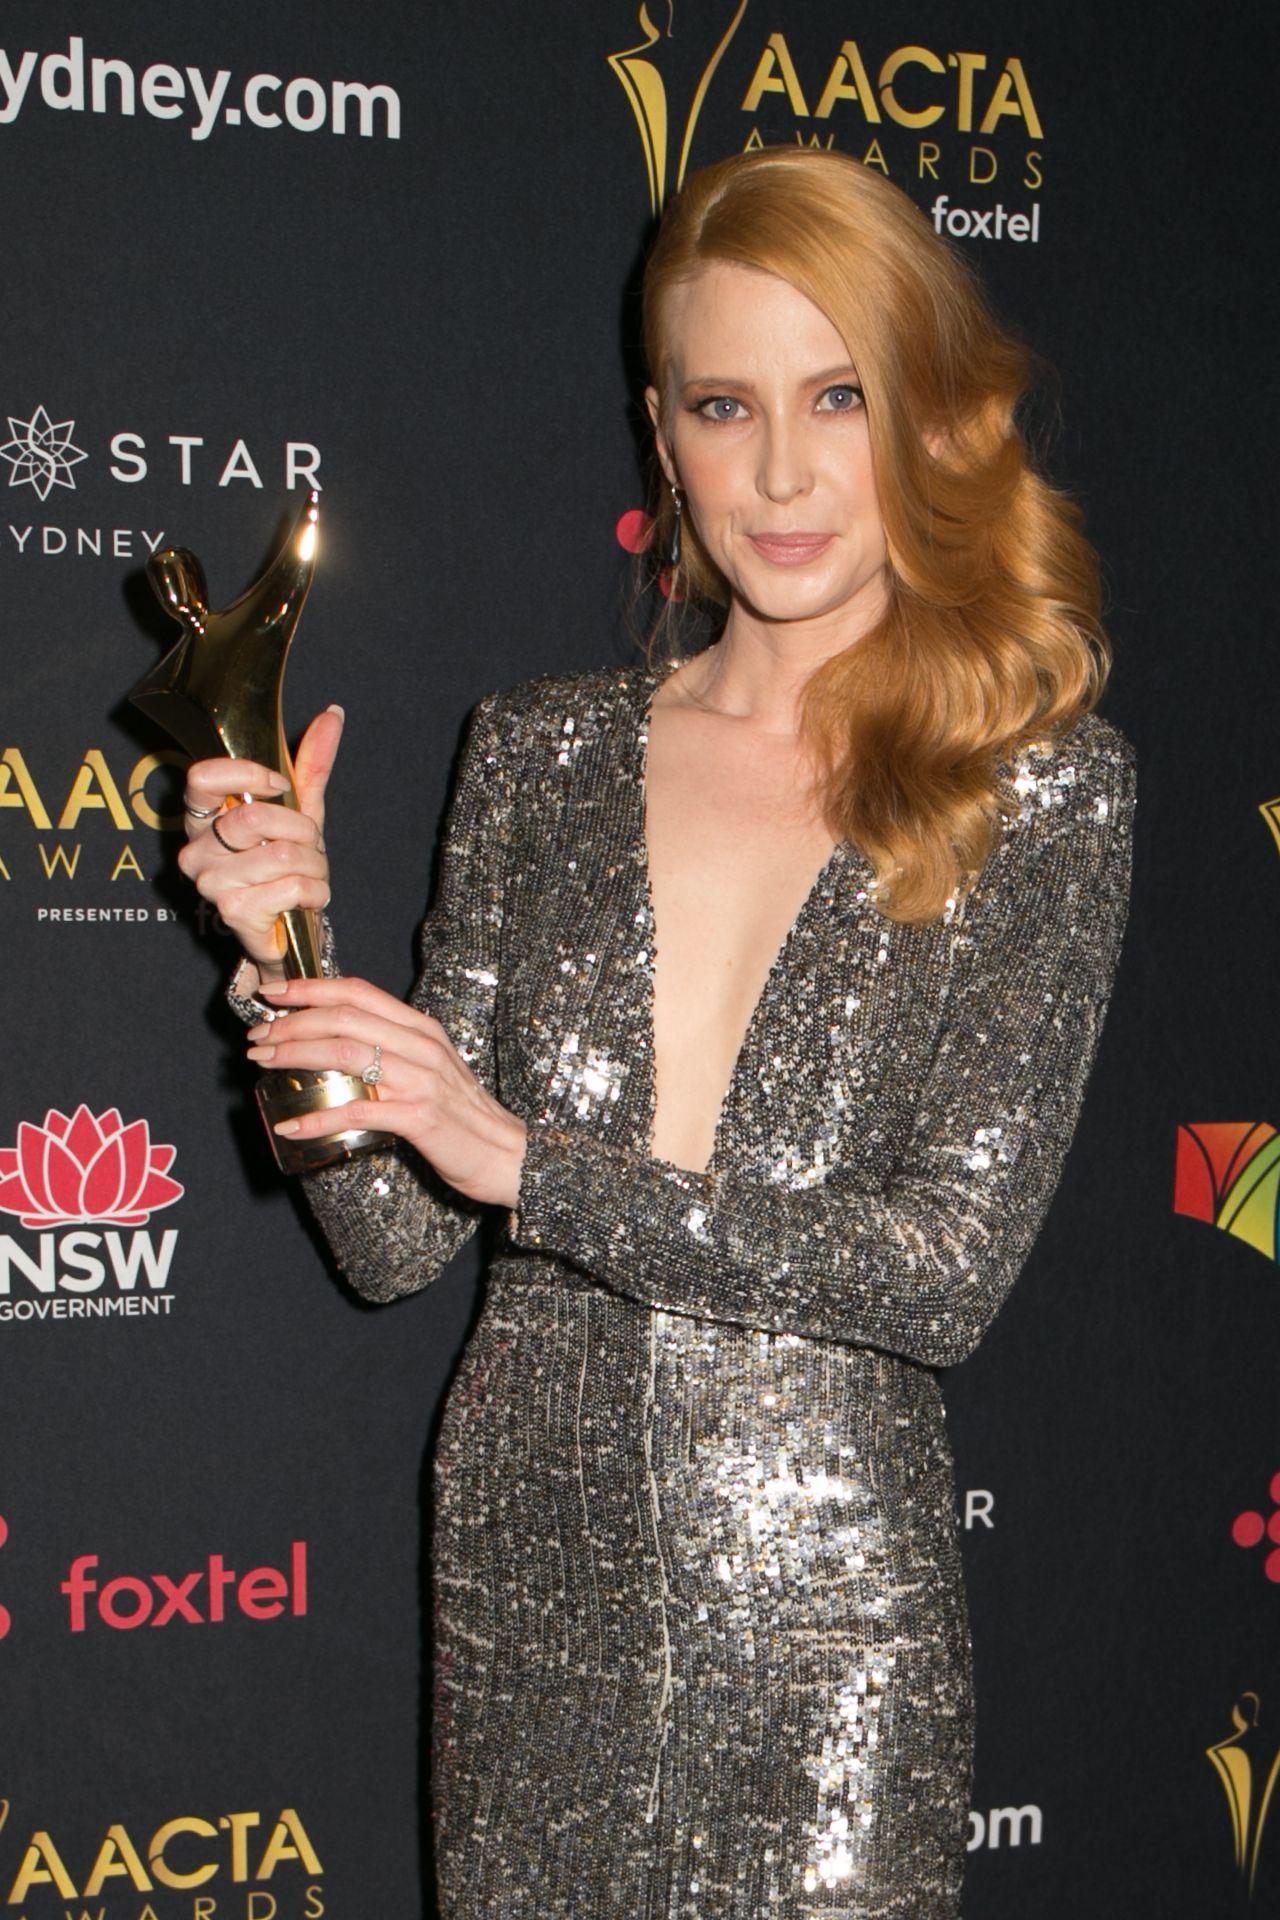 aacta awards - photo #41